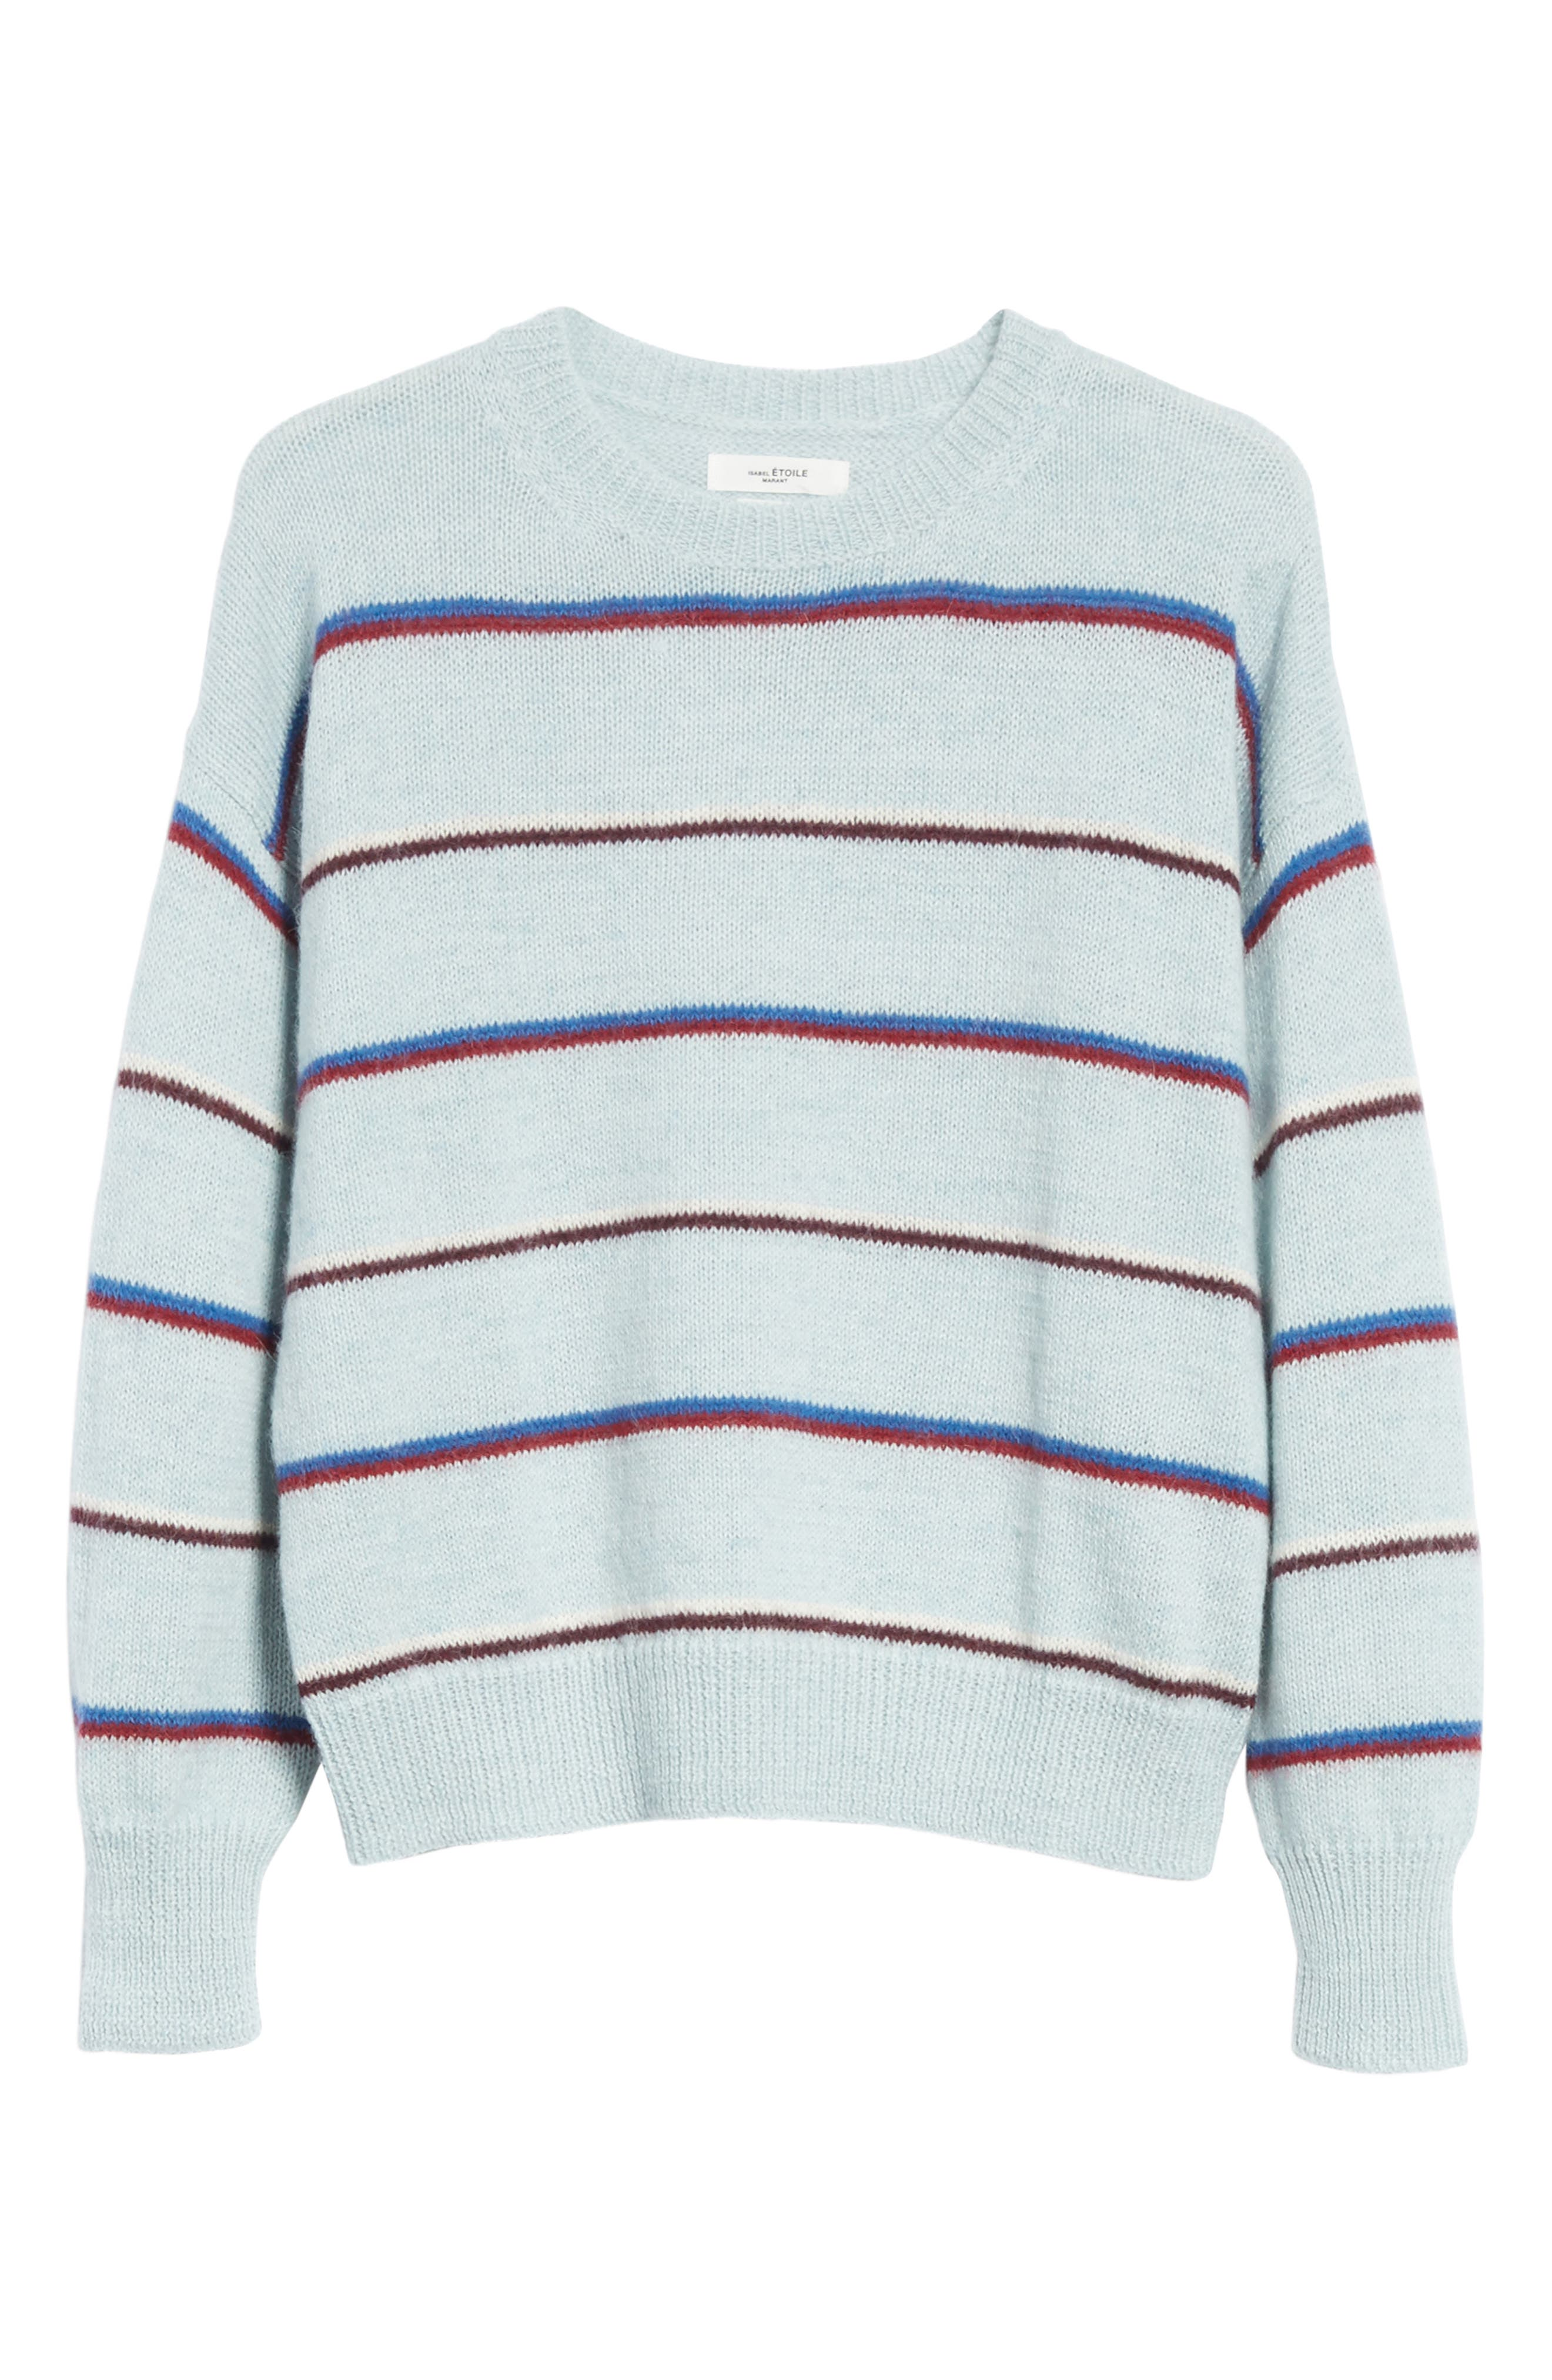 ISABEL MARANT ÉTOILE,                             Gatlin Stripe Alpaca Blend Sweater,                             Alternate thumbnail 6, color,                             400